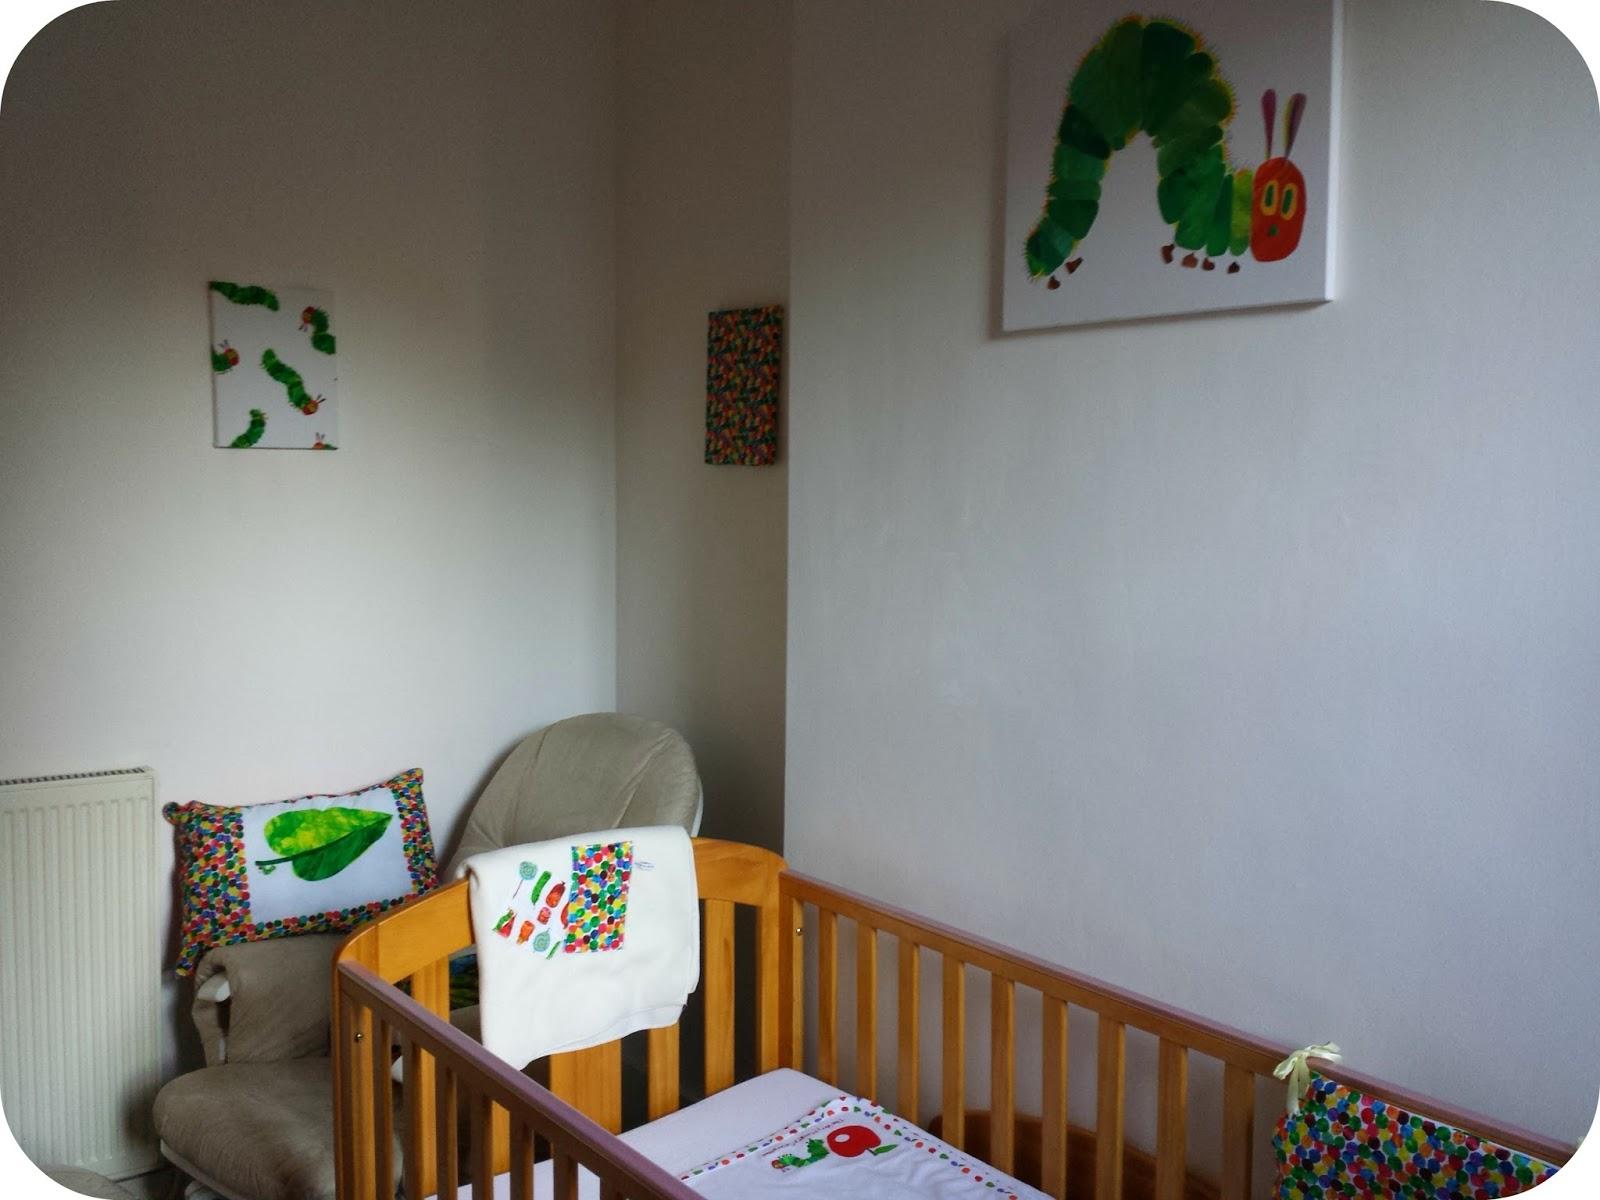 Childrenu0027s Bedroom Themes, The Very Hungry Caterpillar, Hungry Caterpillar  Nursery Part 63